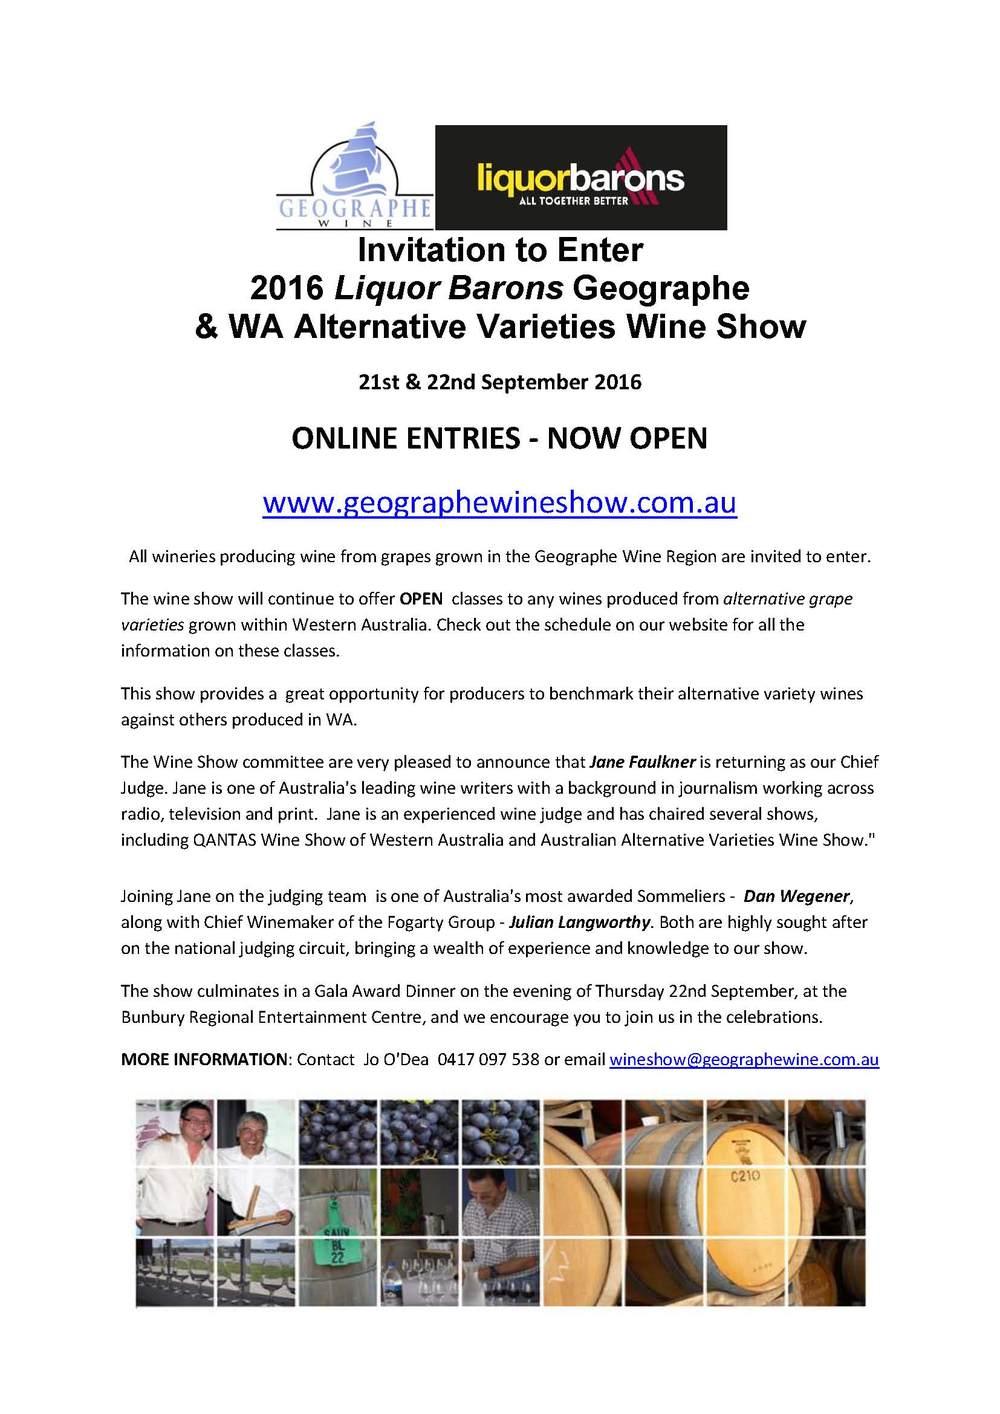 wineshow@geographewine.com.au